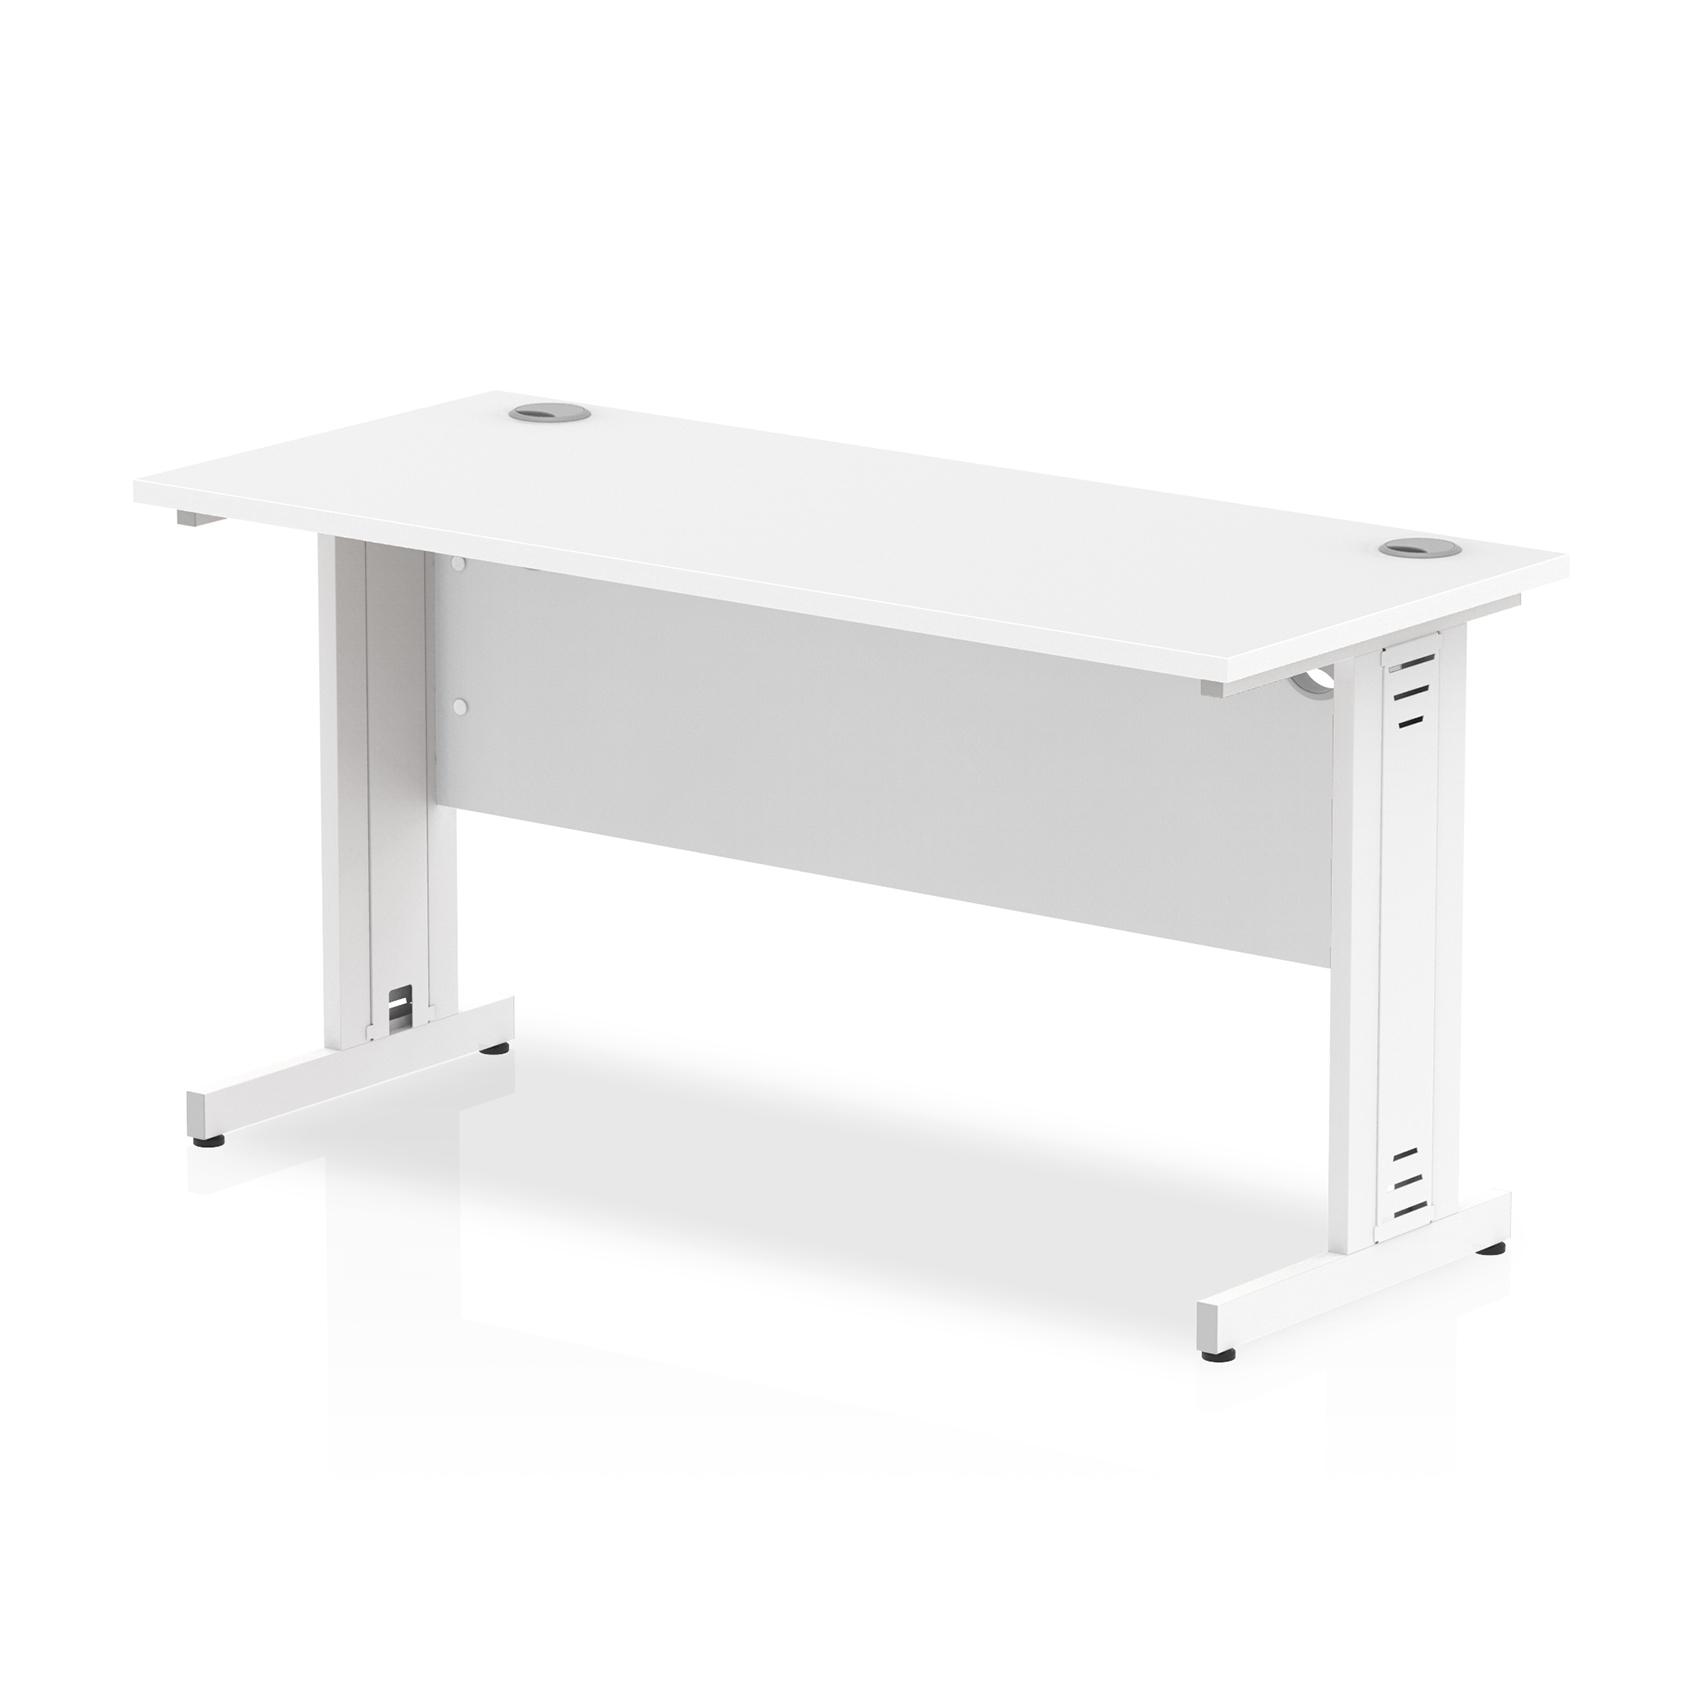 Trexus Desk Rectangle Cable Managed White Leg 1400x600mm White Ref MI002282